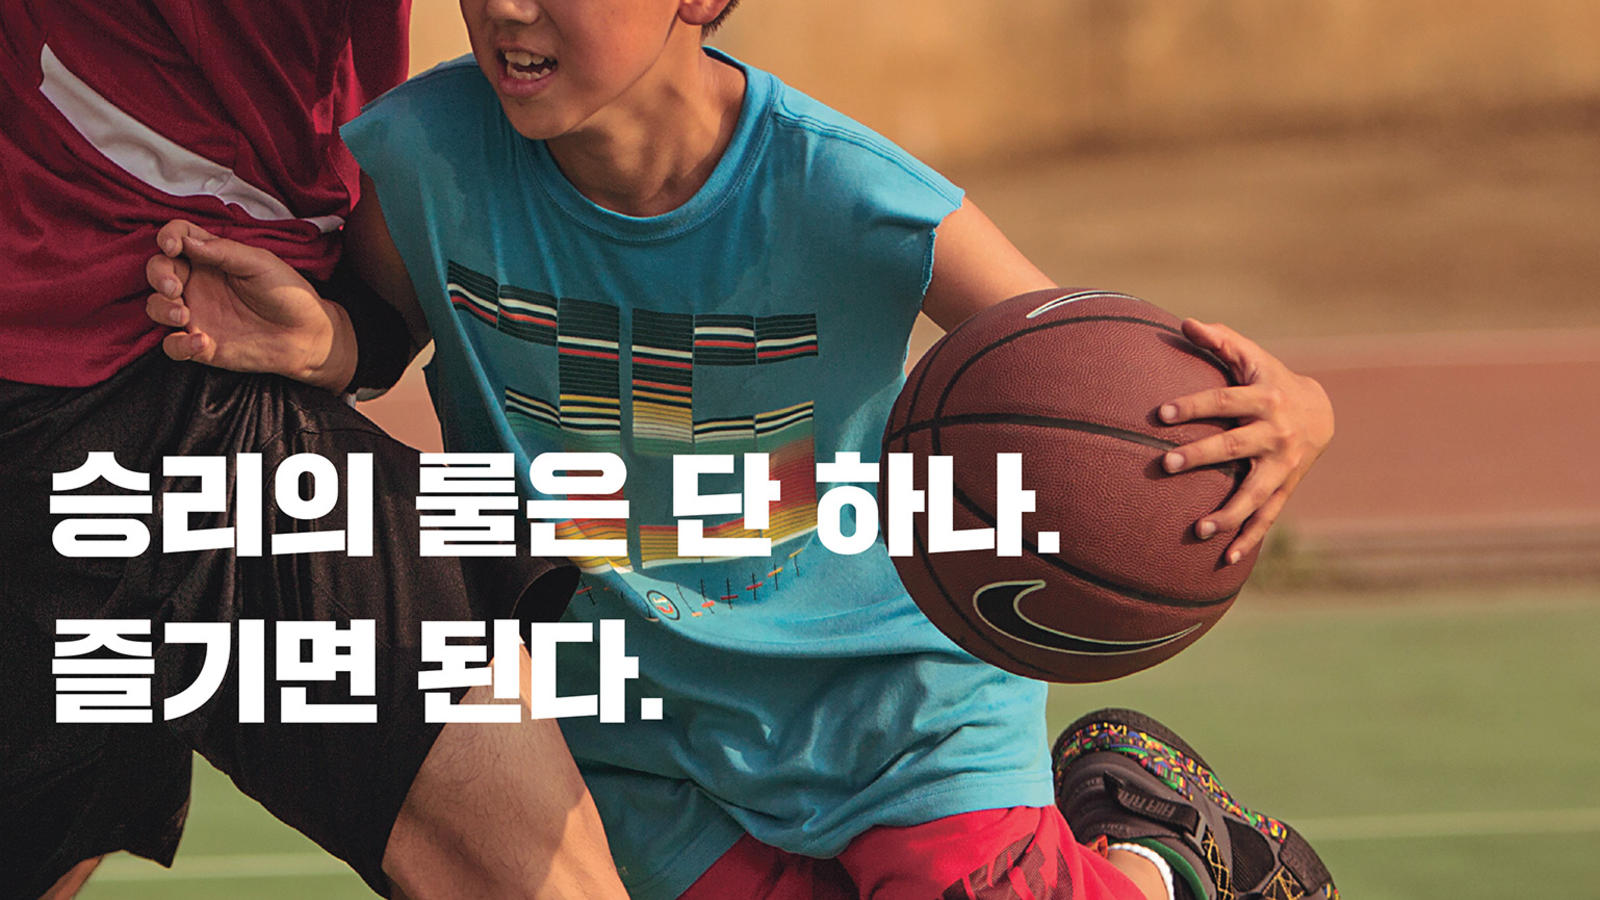 vertical_basketball_jdi_copy